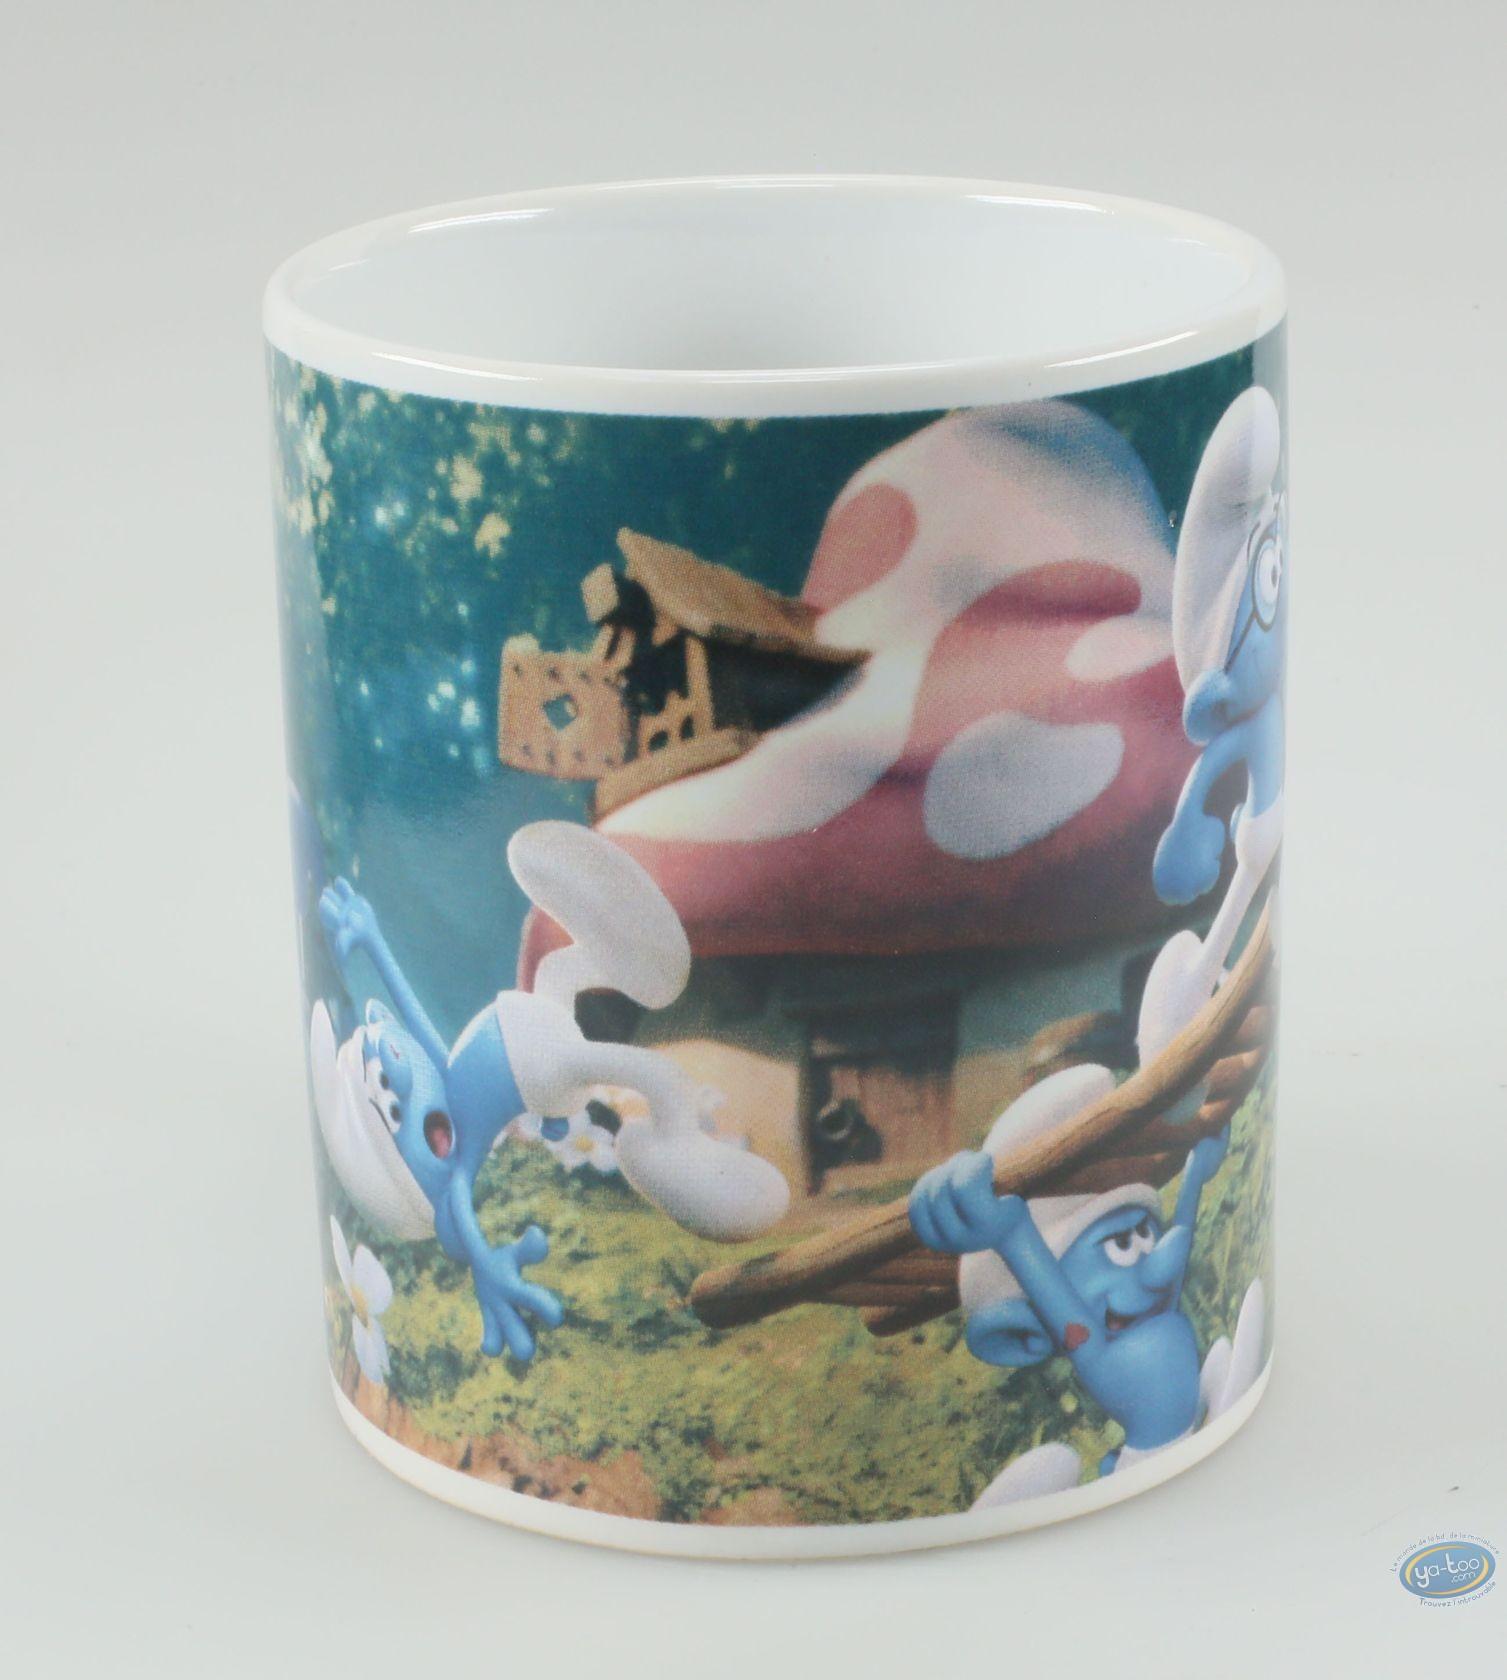 Tableware, Smurfs (The) : Mug Smurf The lost village - Brainy